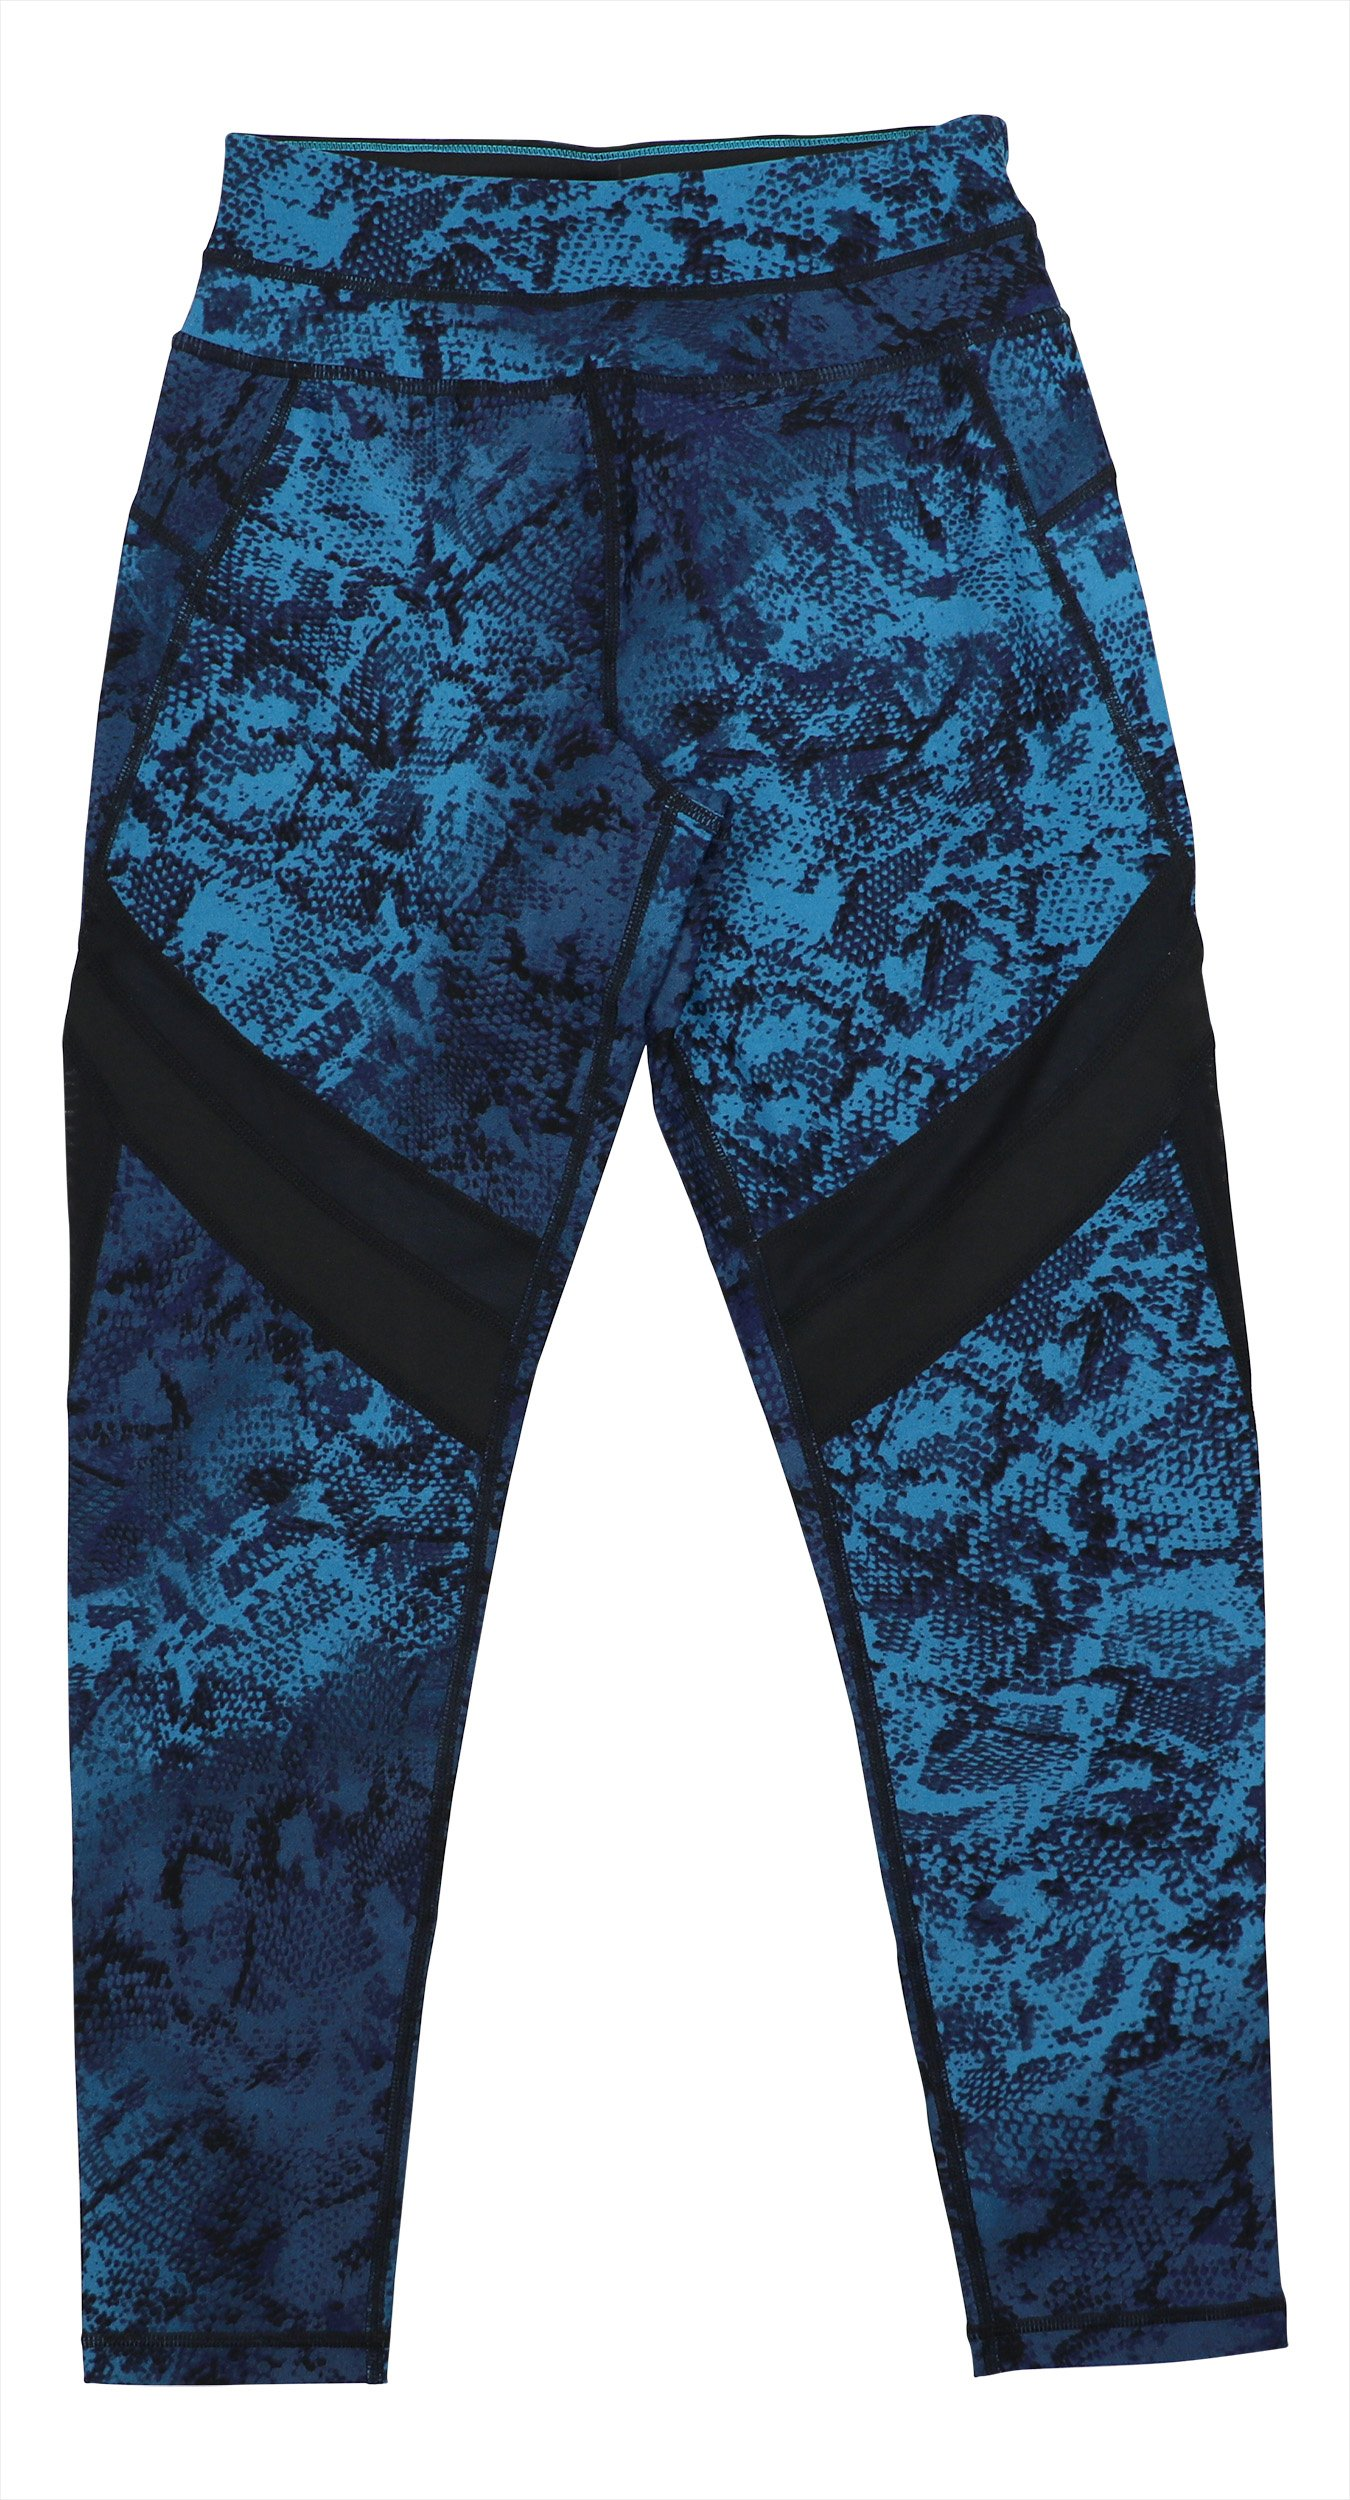 Calvin Klein Performance Womens Fitness High-Waist Athletic Leggings Blue S